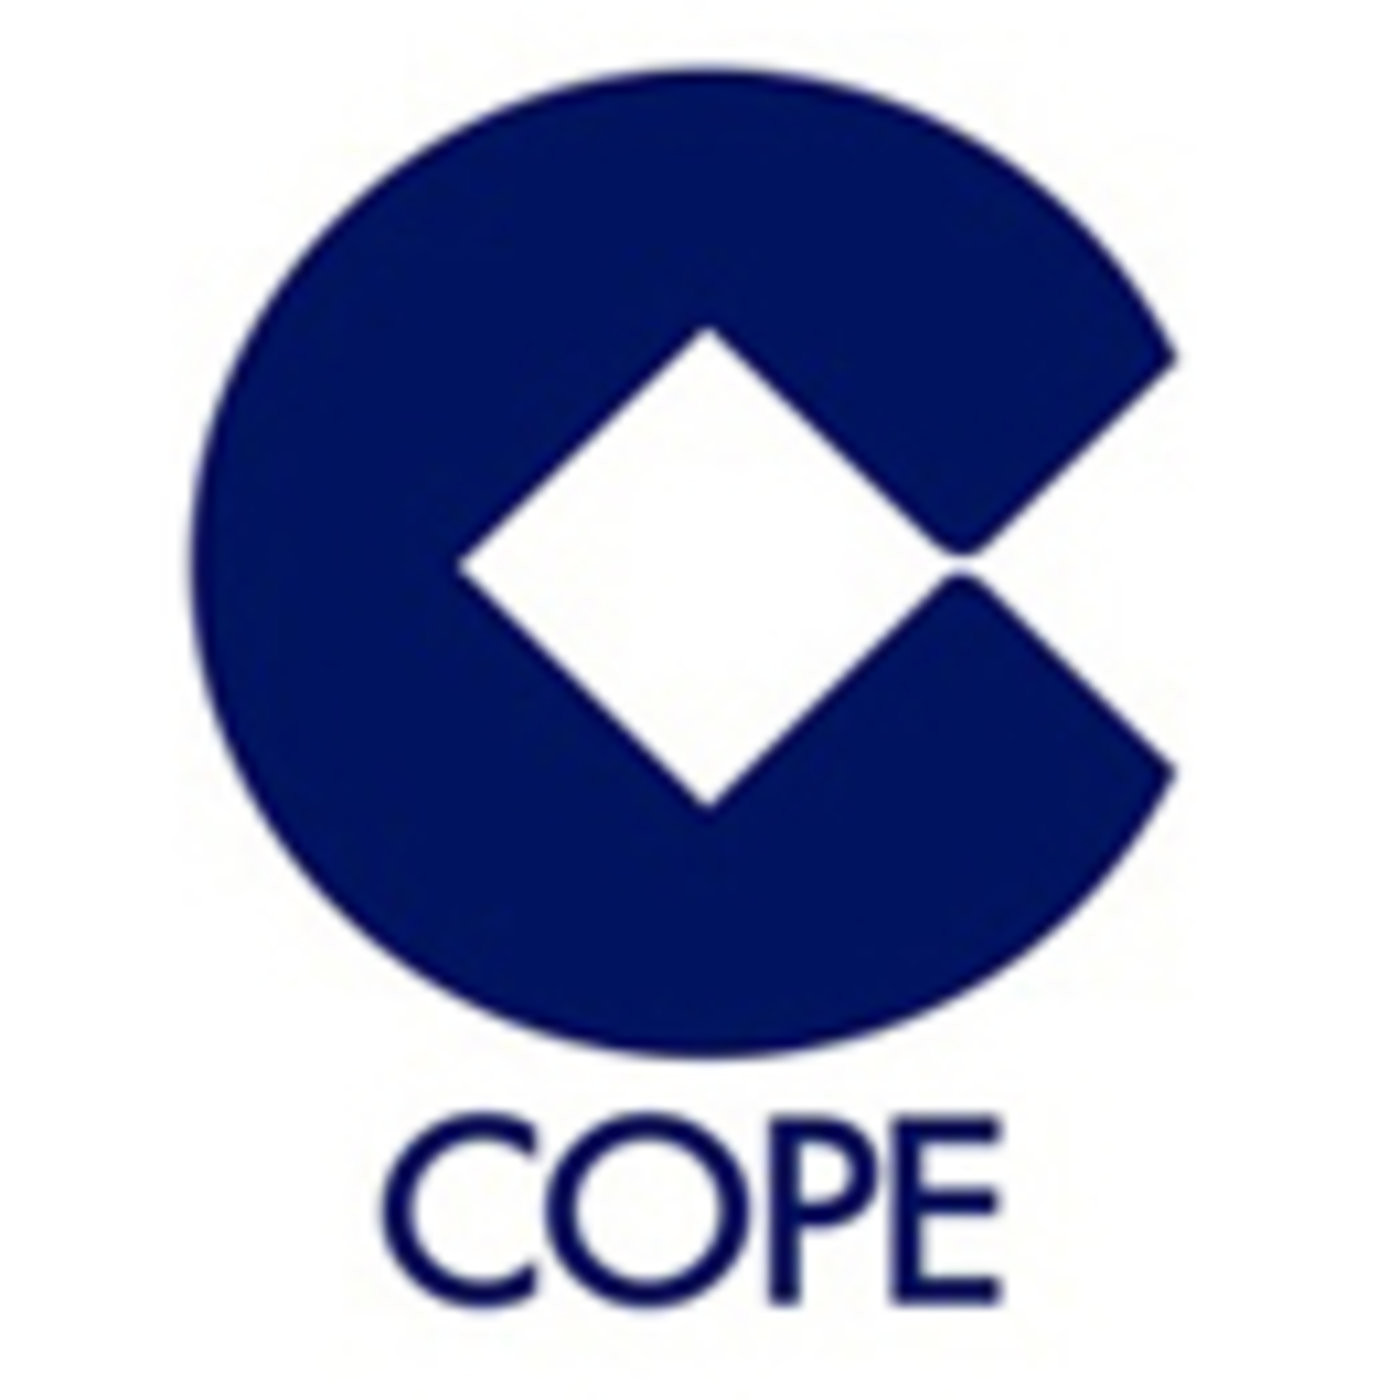 Deportes Cope Santiago 02-10-2020 de 15:30 a 16:00